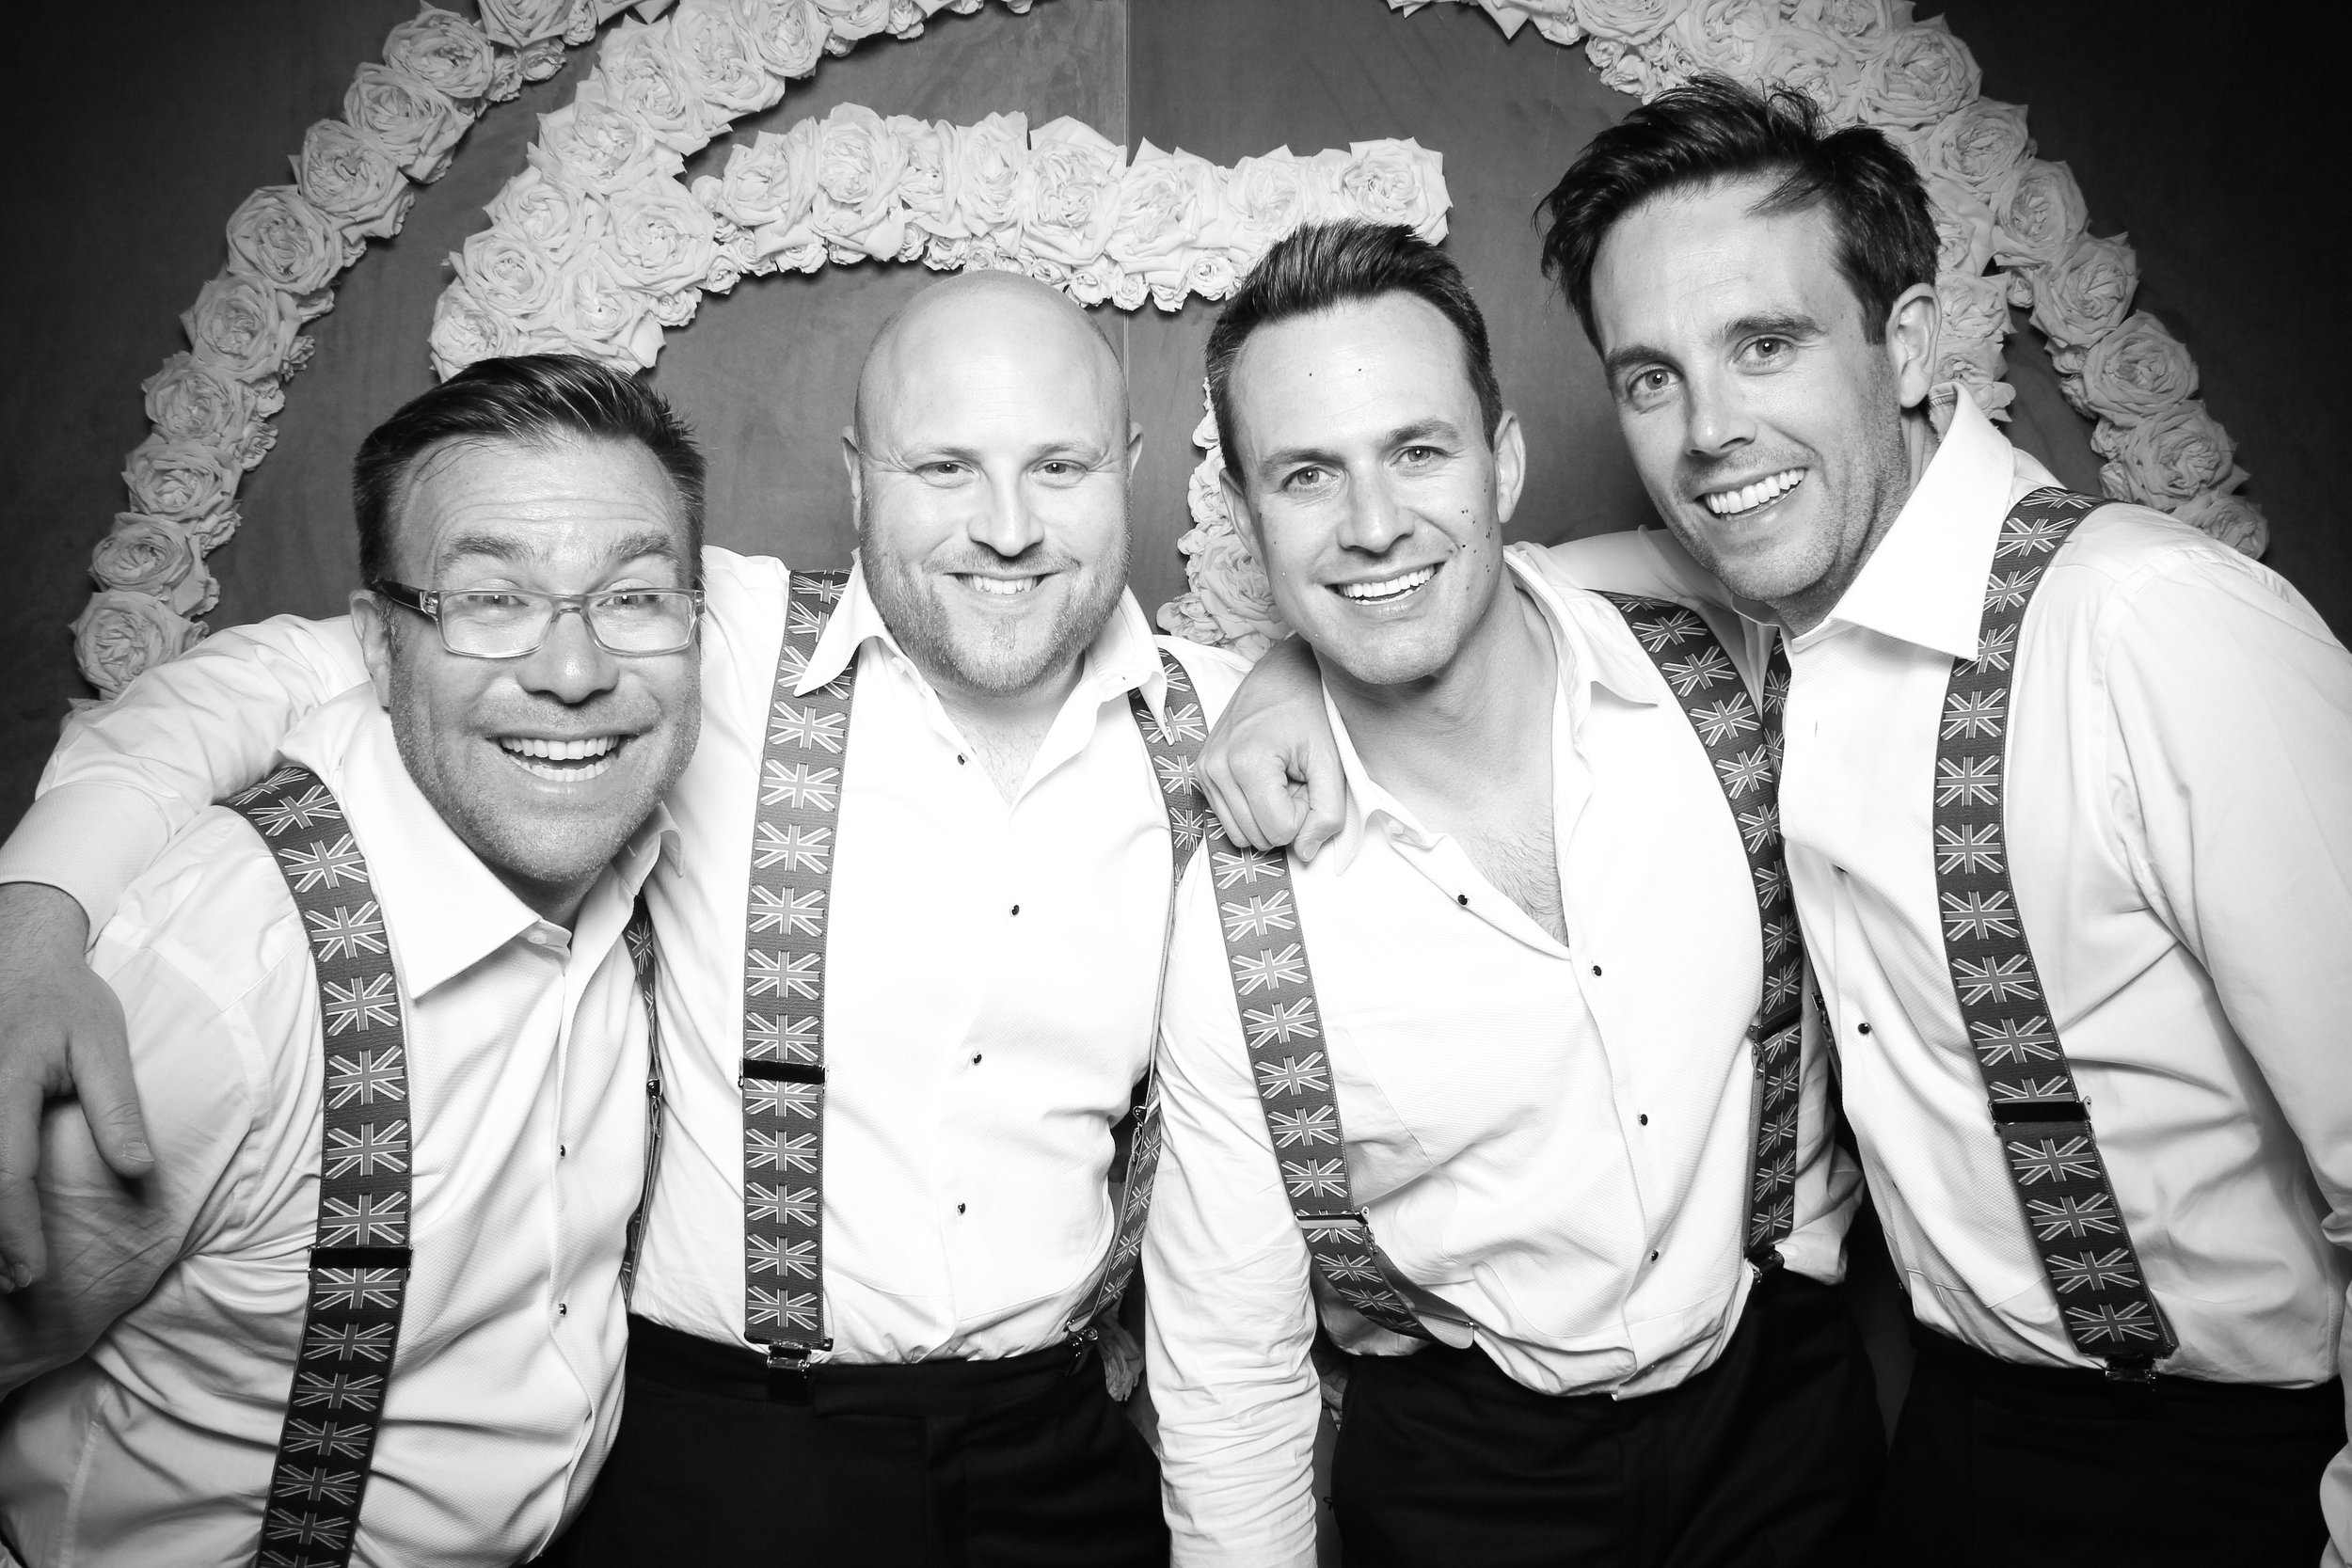 Photo_Booth_Rental_At_Standard_Club_Wedding_Chicago_26.jpg